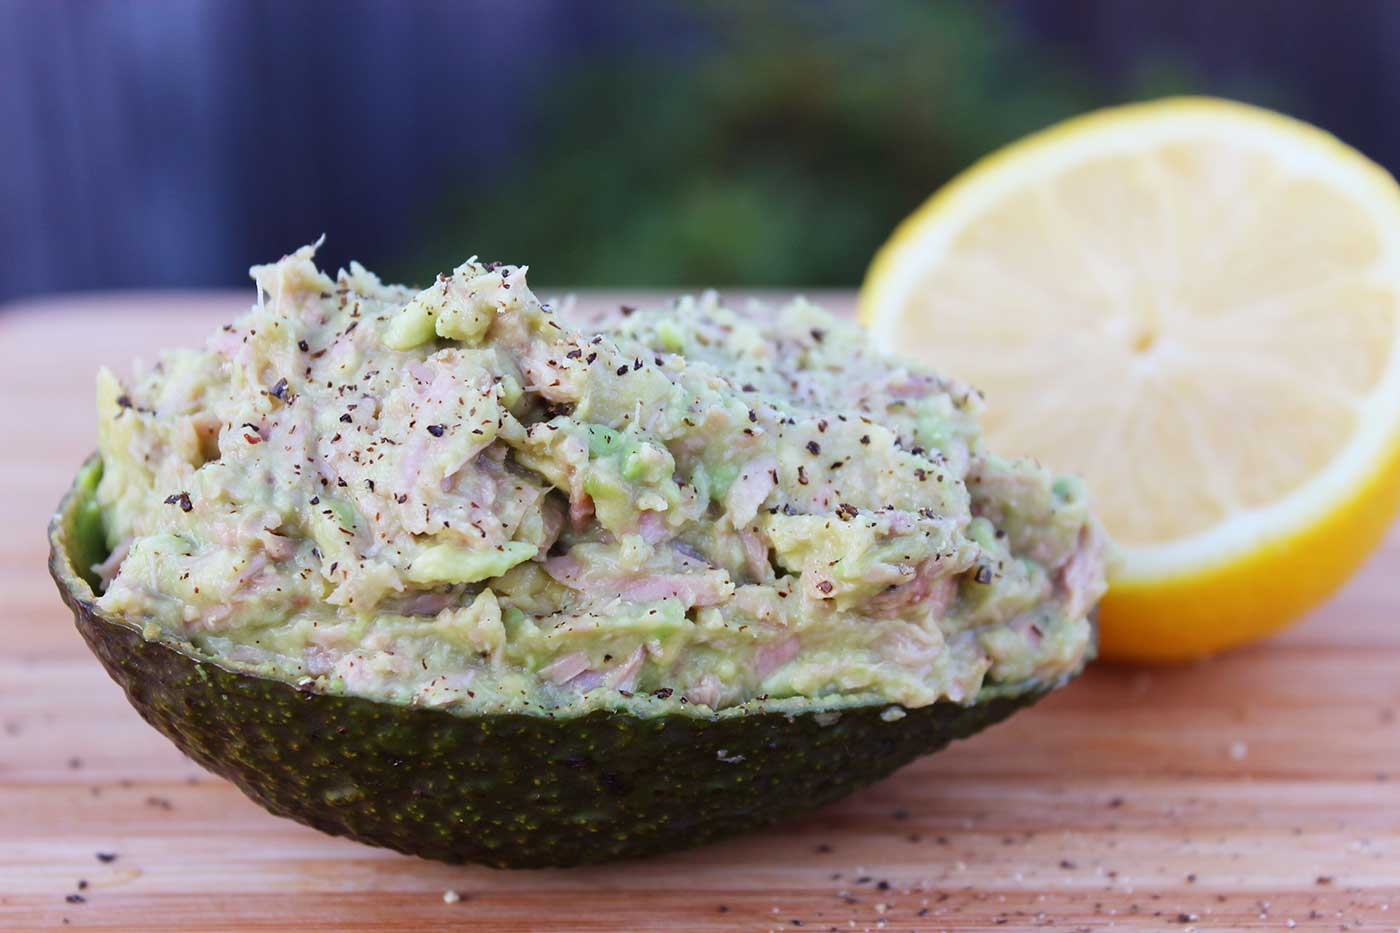 Tuna-Avocado-Lemon-Dip-Thermomix-Recipe